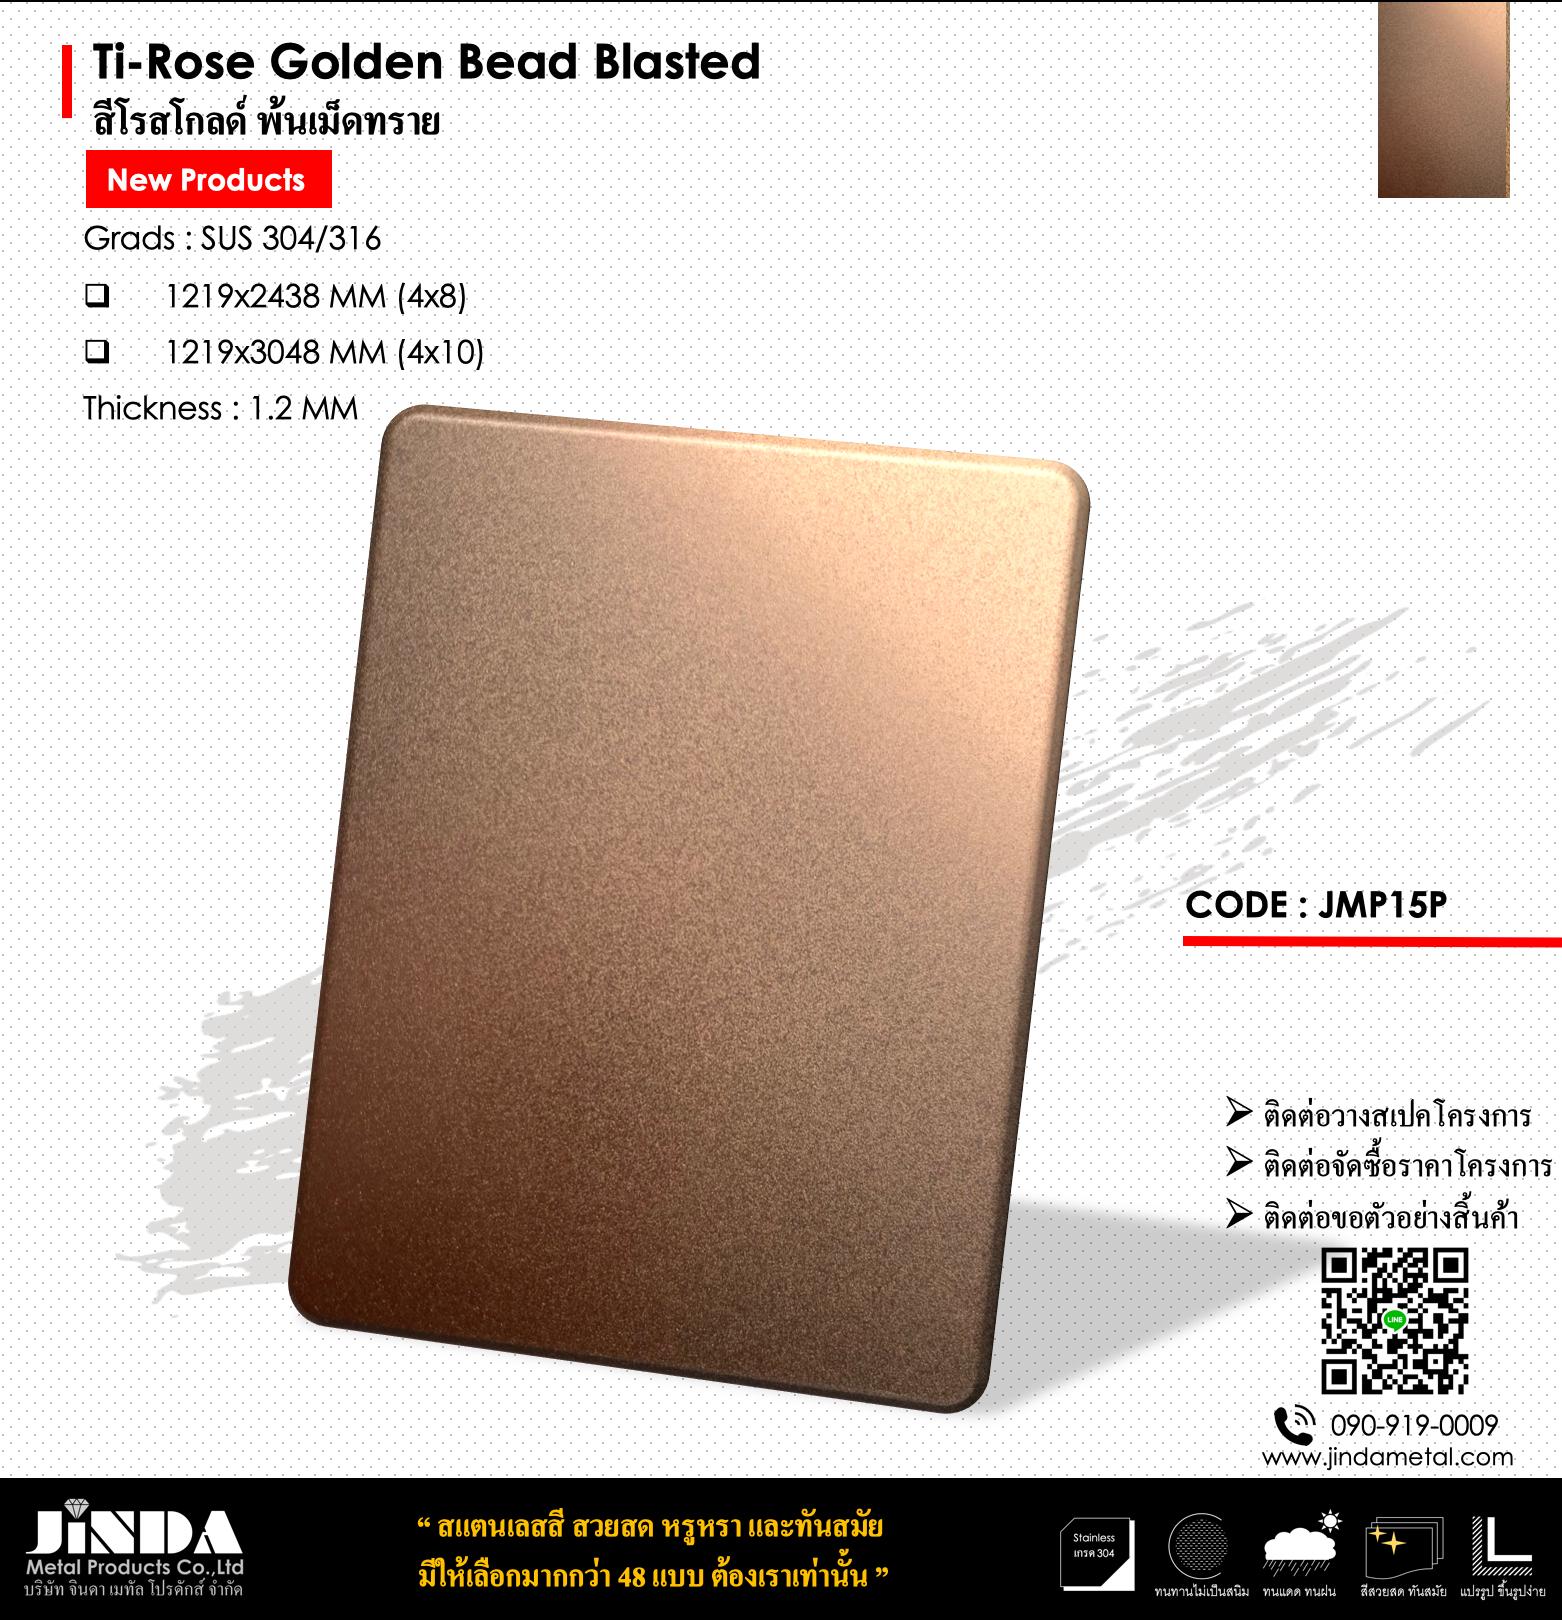 Ti-Rose Golden Bead Blasted   สีโรสโกลด์ พ้นเม็ดทราย